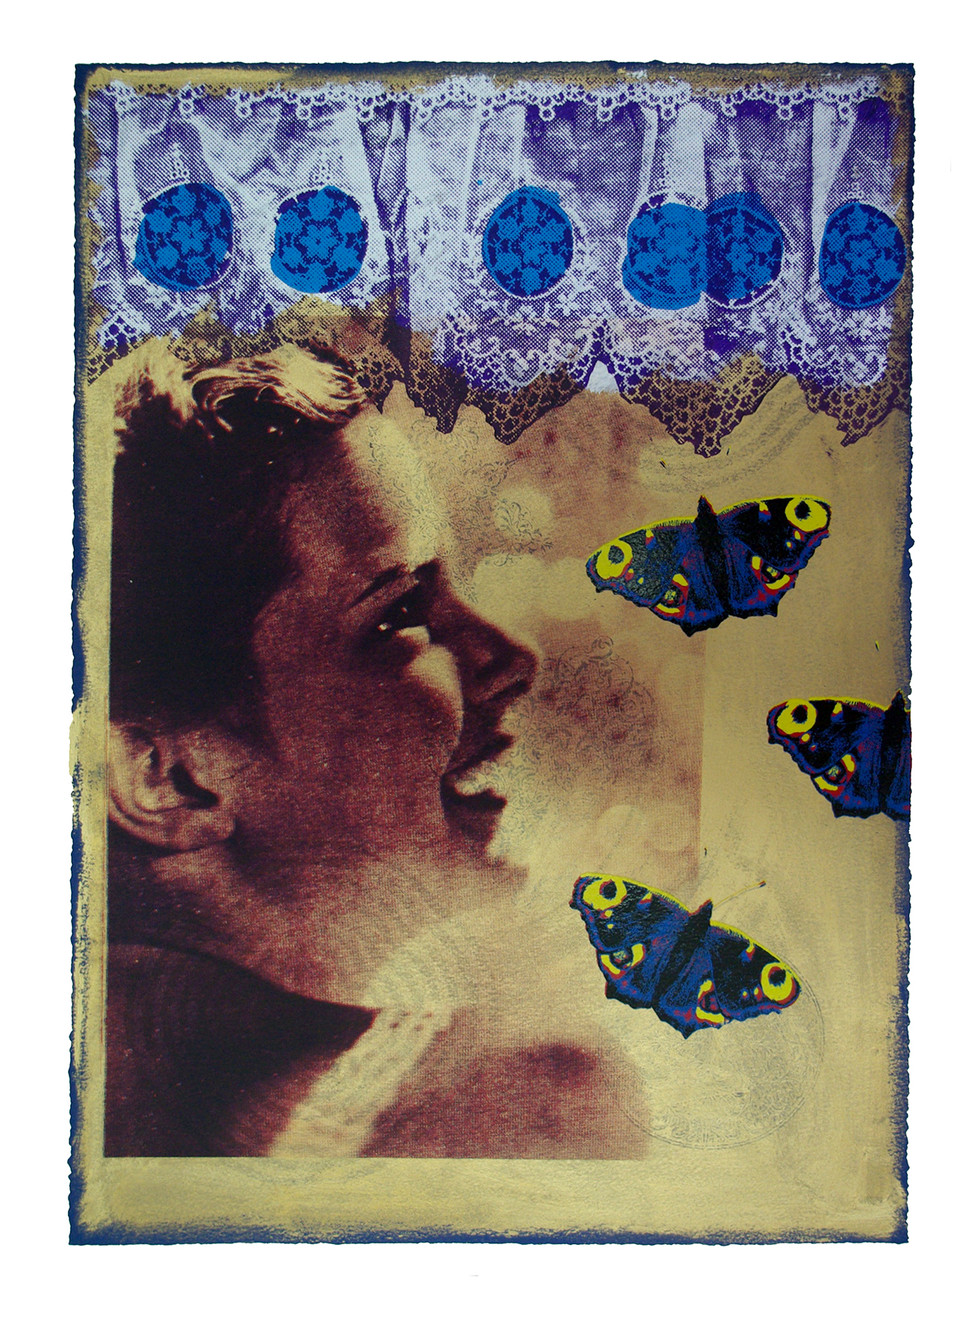 Jane Sampson 'Butterfly Baby' Screenprint 56 x 76cm edn 20